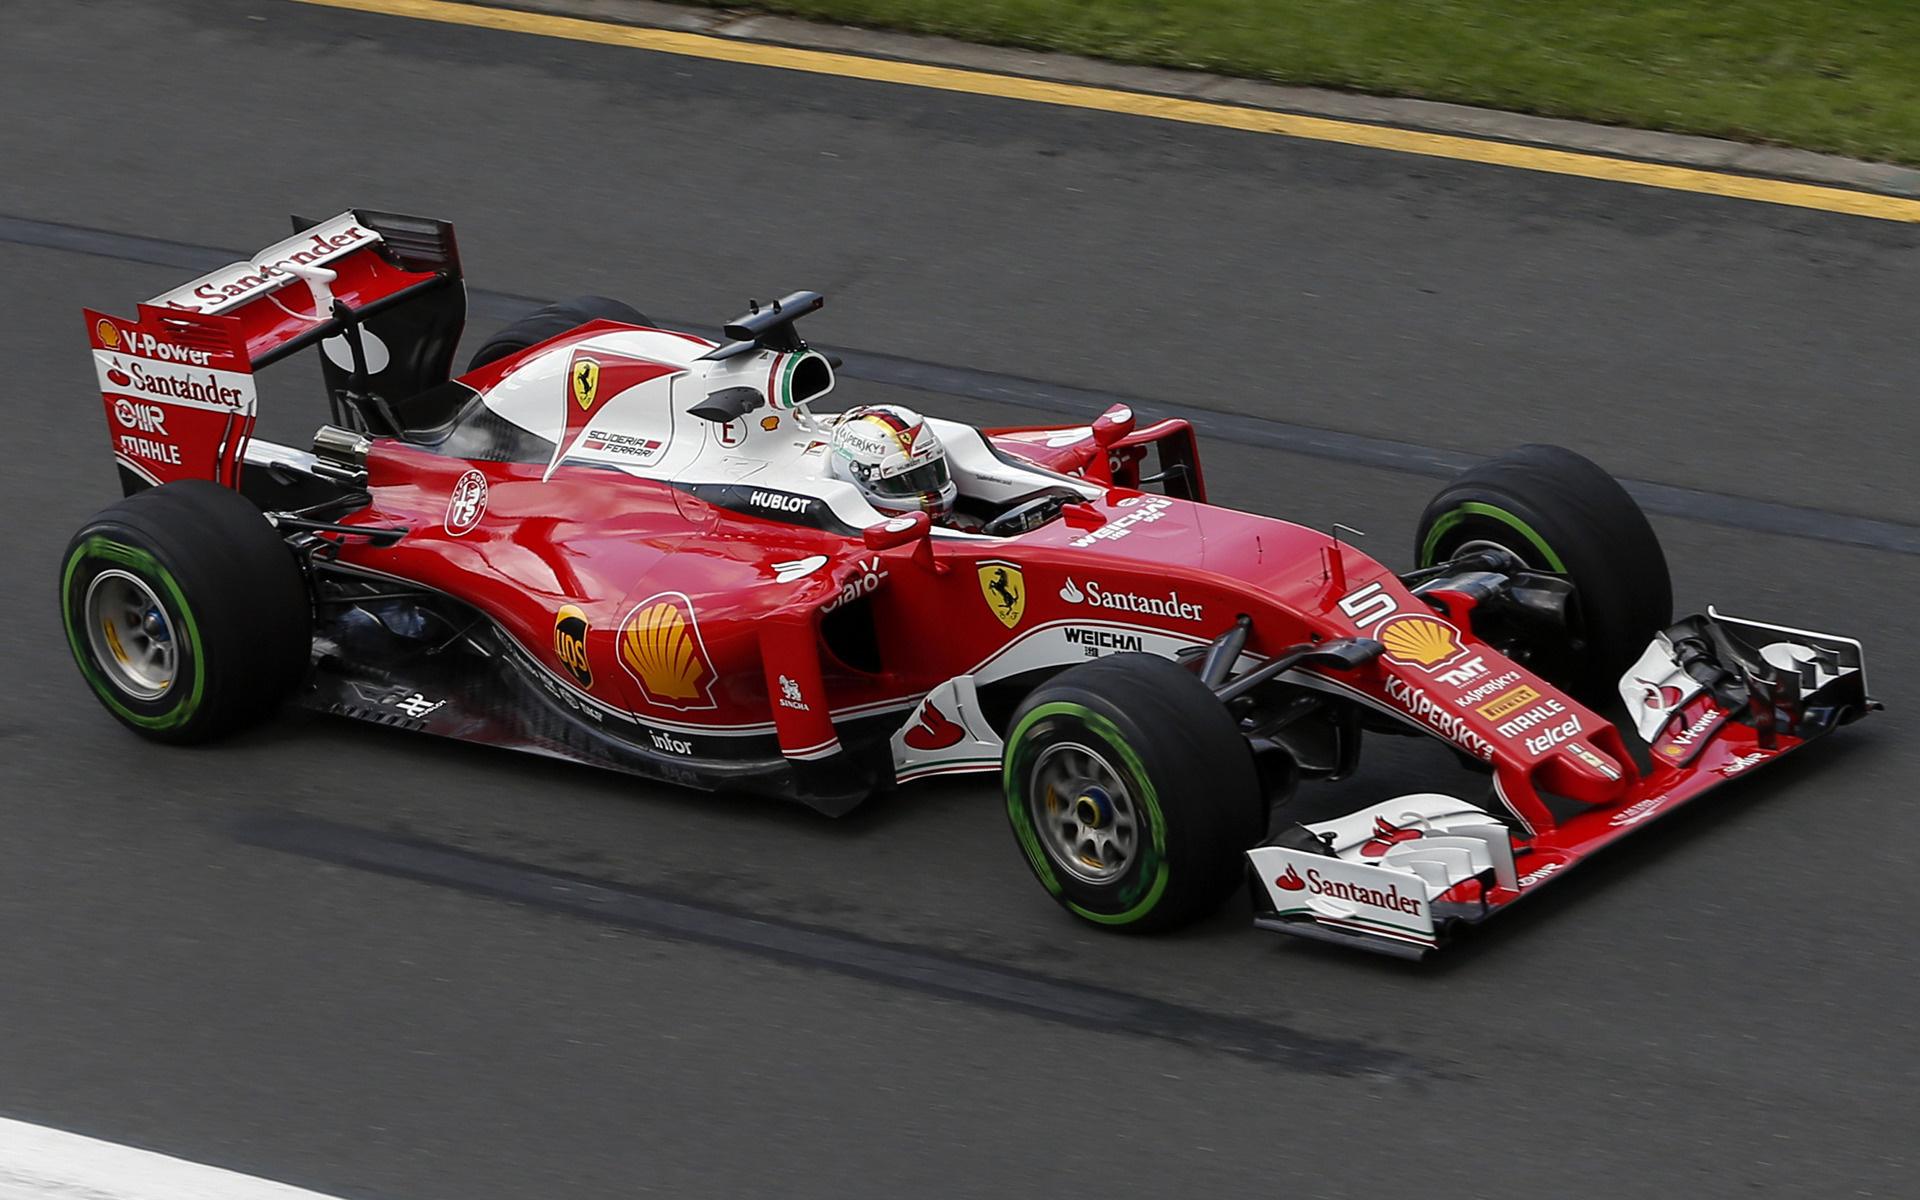 Ferrari Sf16 H 2016 Wallpapers And Hd Images Car Pixel